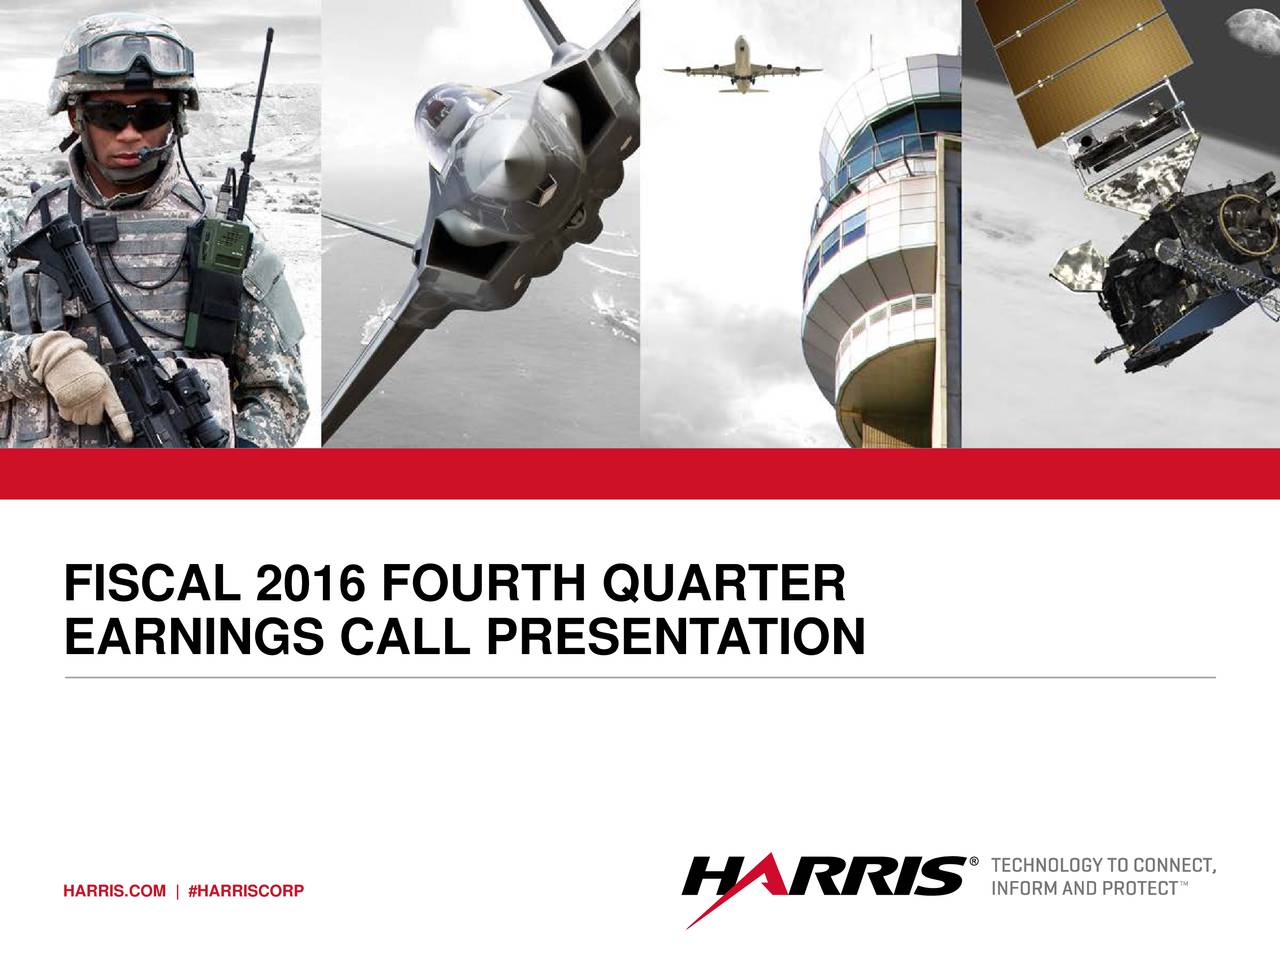 (10 x 3.5) FISCAL 2016 FOURTH QUARTER EARNINGS CALL PRESENTATION HARRIS.COM | #HARRISCORP